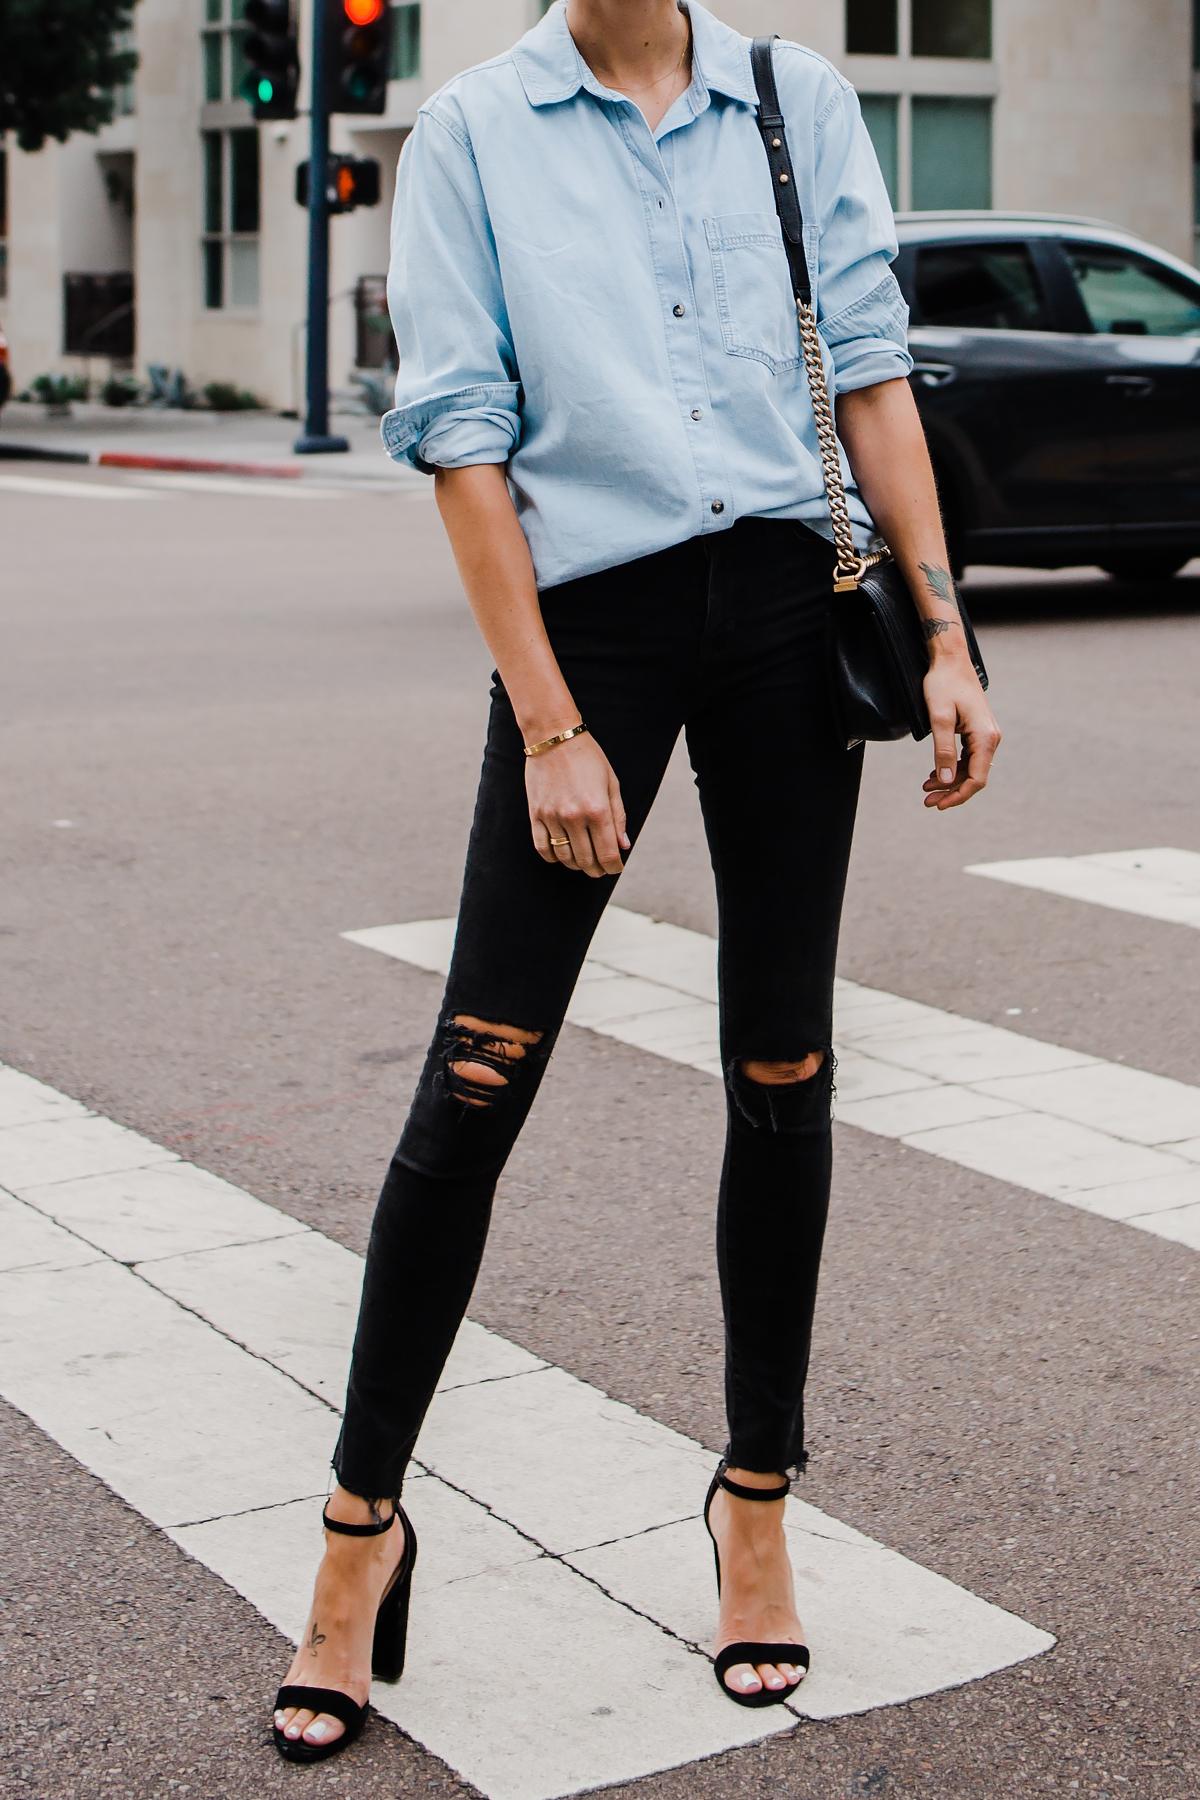 Woman Wearing Topshop Oversized Denim Shirt Topshop Black Ripped Skinny Jeans Steve Madden Black Ankle Strap Heeled Sandals Fashion Jackson San Diego Blogger Fashion Blogger Street Style